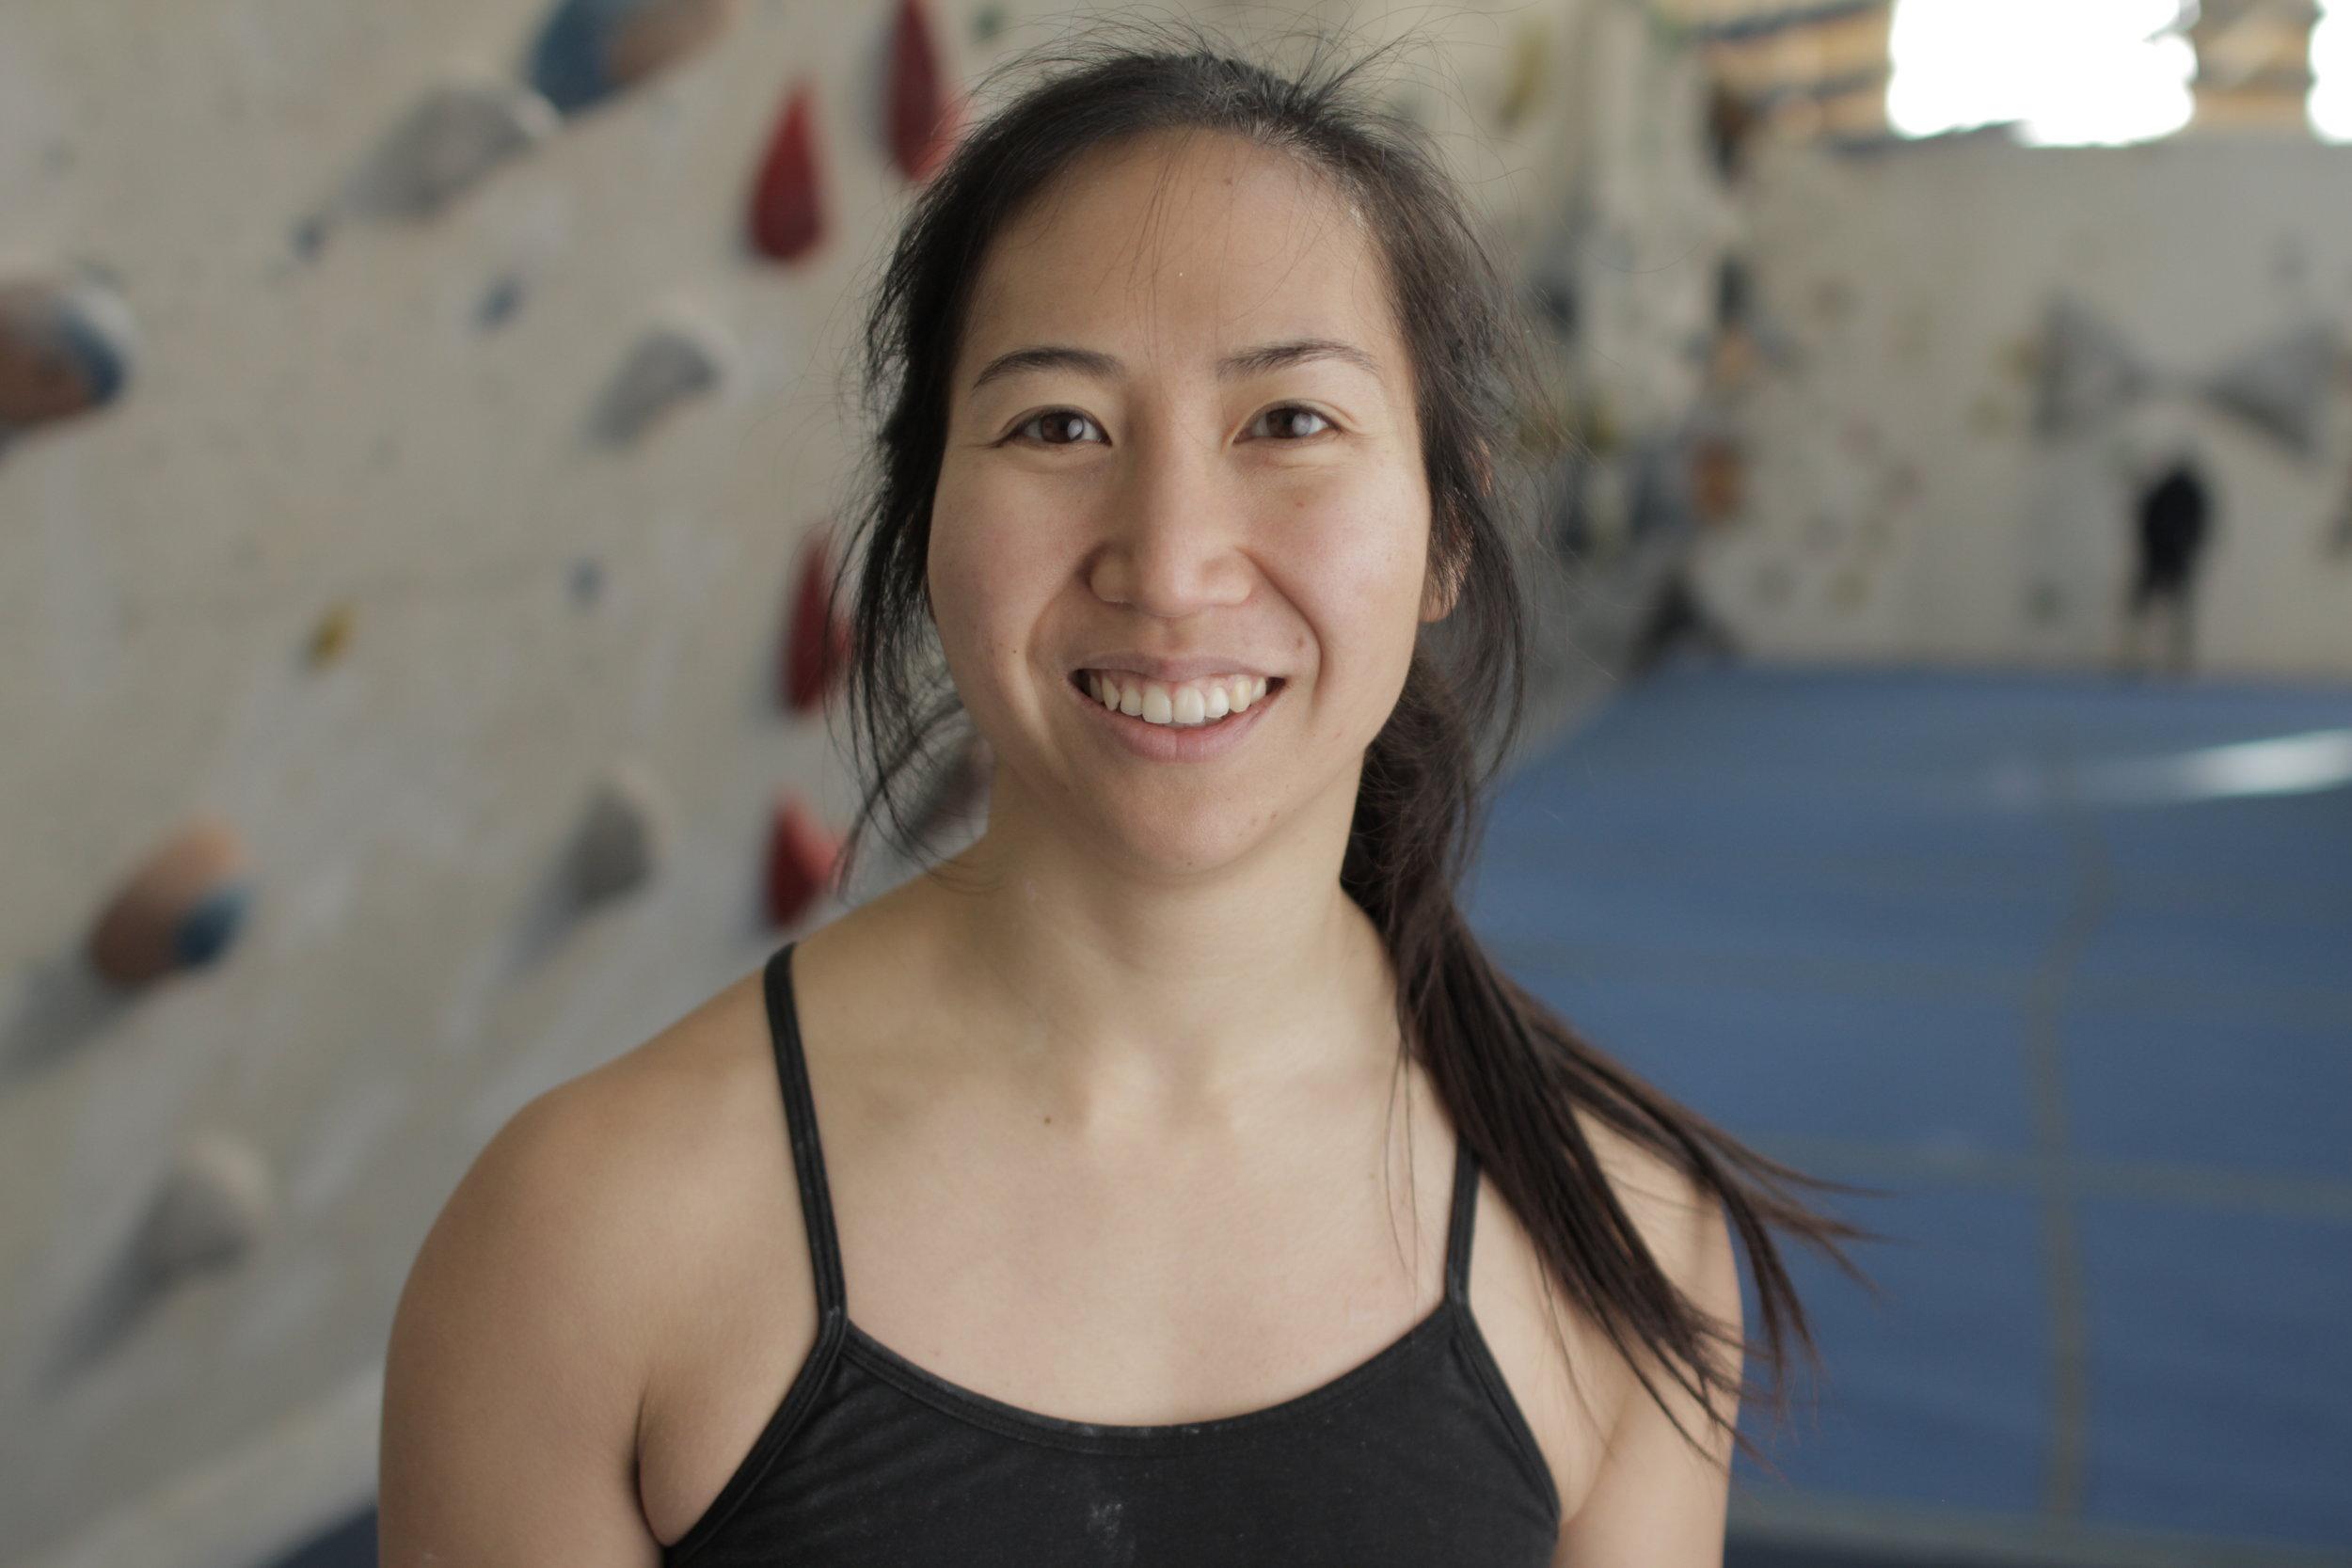 Fun fact: Xian can do a one arm pull-up.  Check out her climbing videos  @xiangoh_